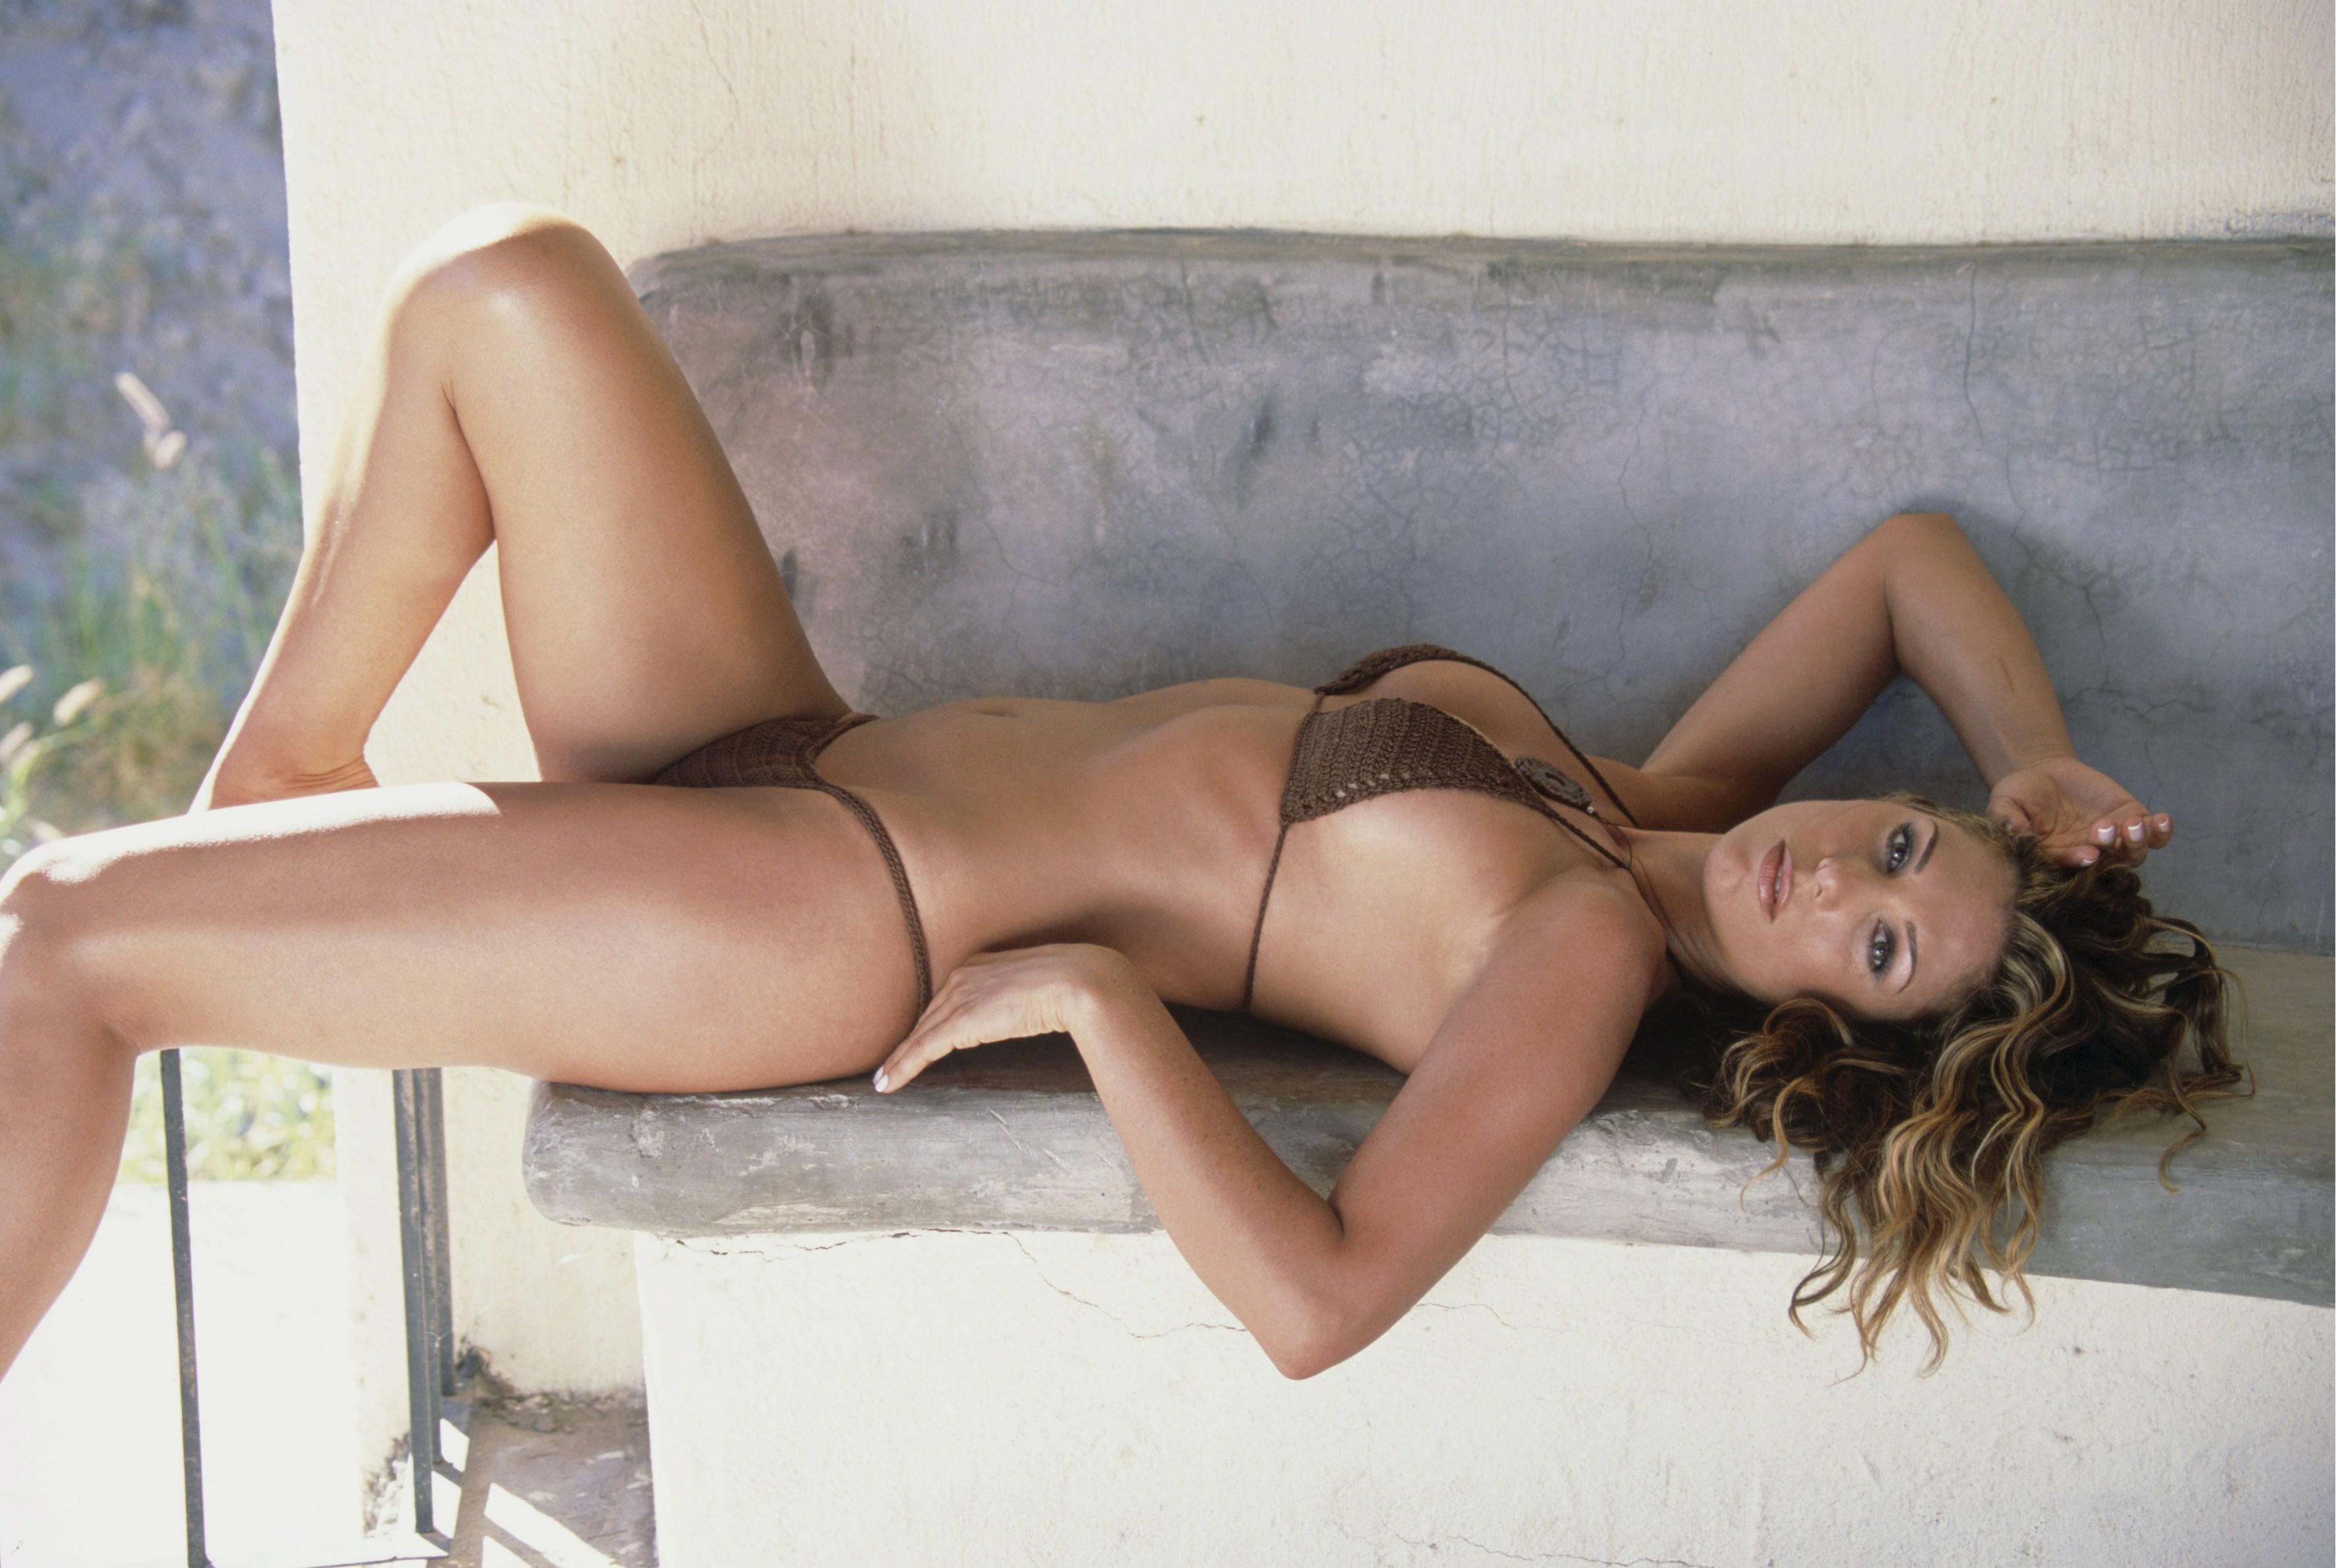 47368_Daisey_Fuentes_bikini_18_122_854lo.jpg